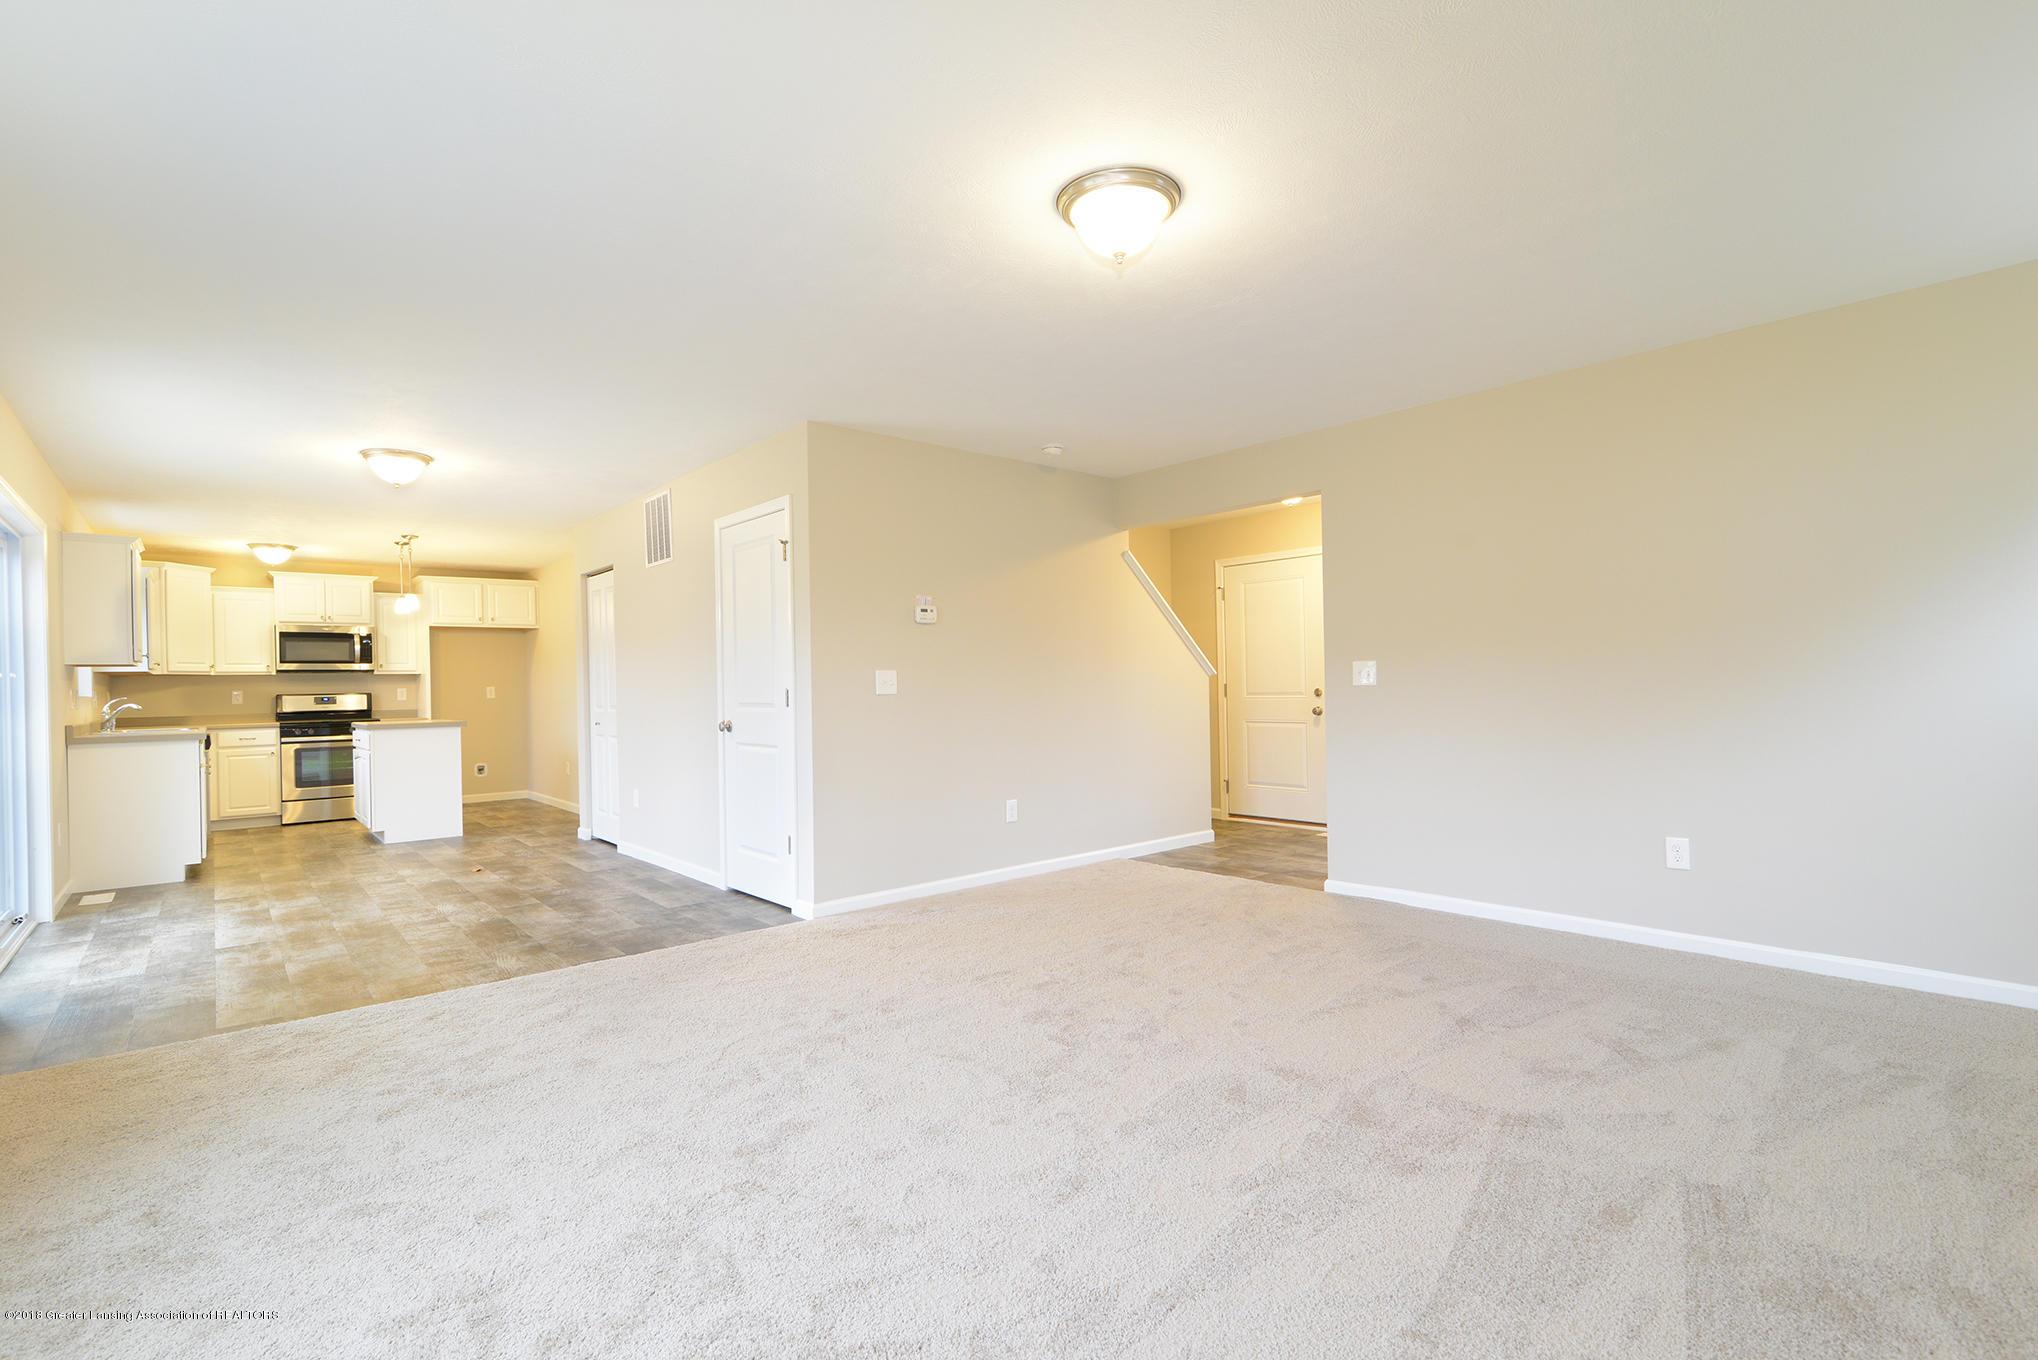 3586 Fernwood Ln - GDN111-E1700 Great Room-2 - 2